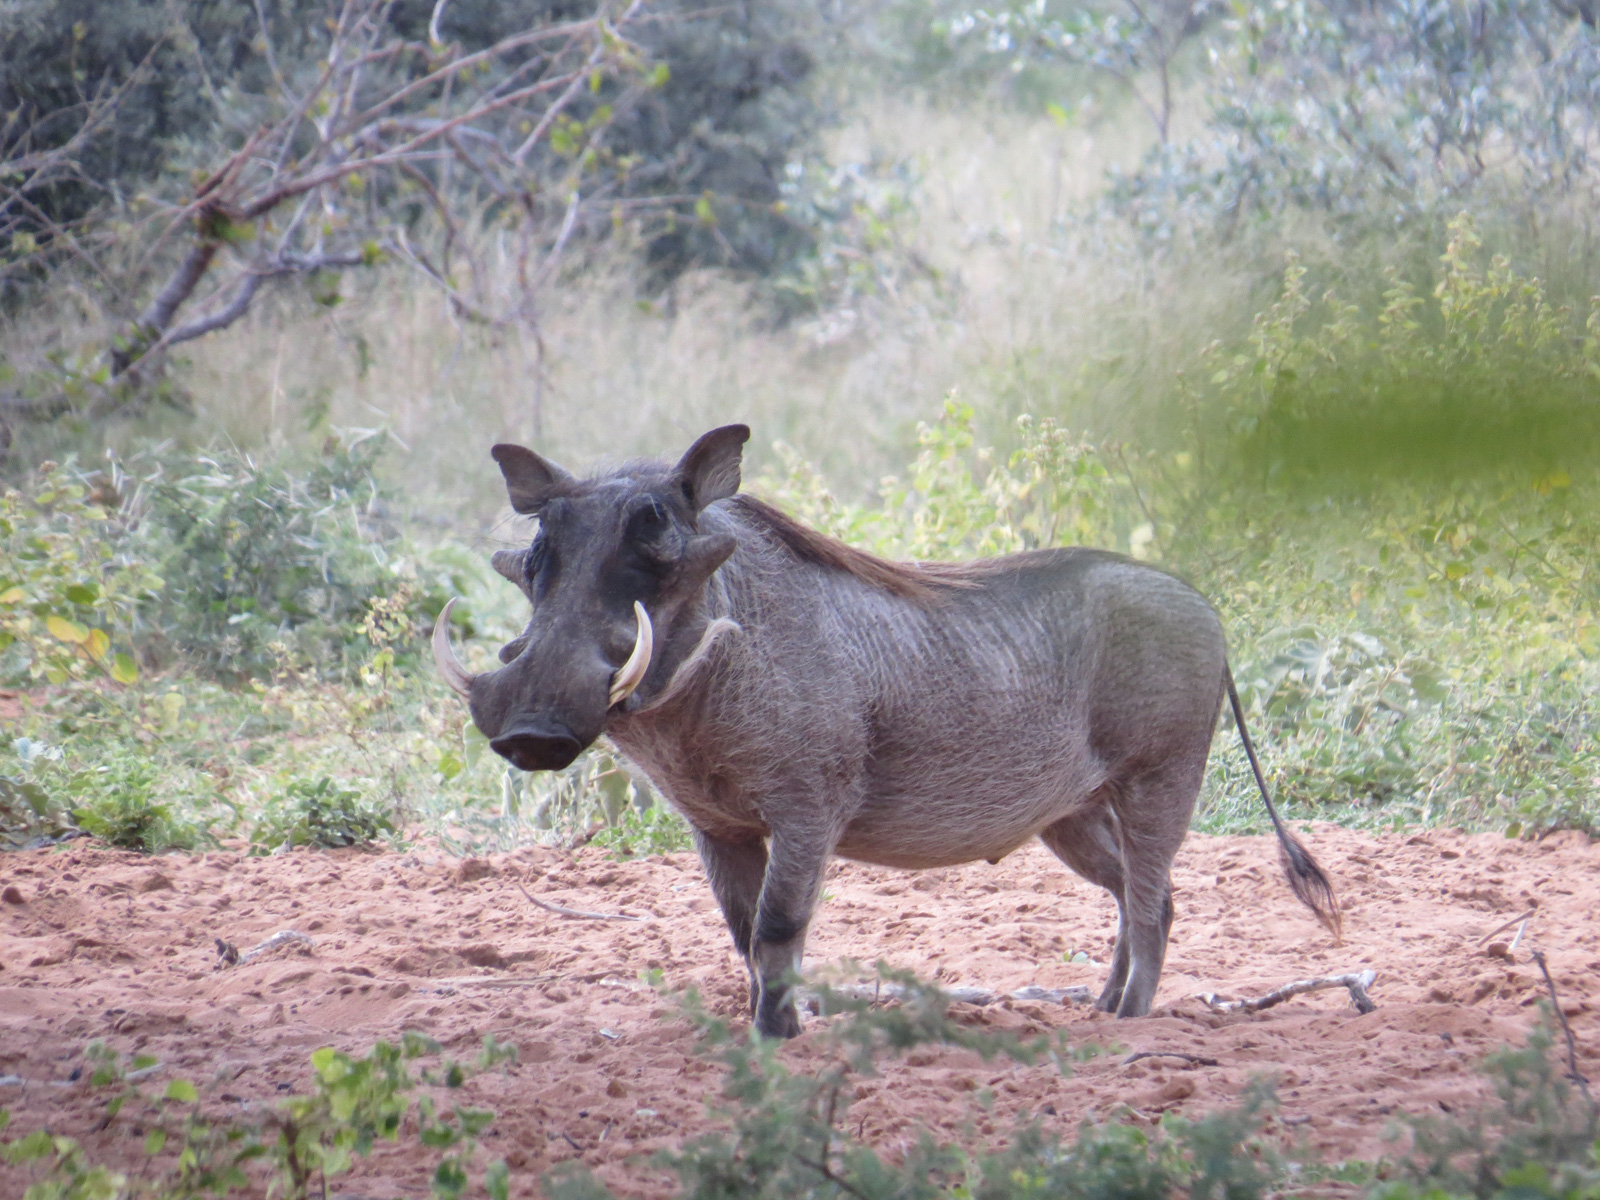 Warthog. Photo credit: Chivic African Safaris.